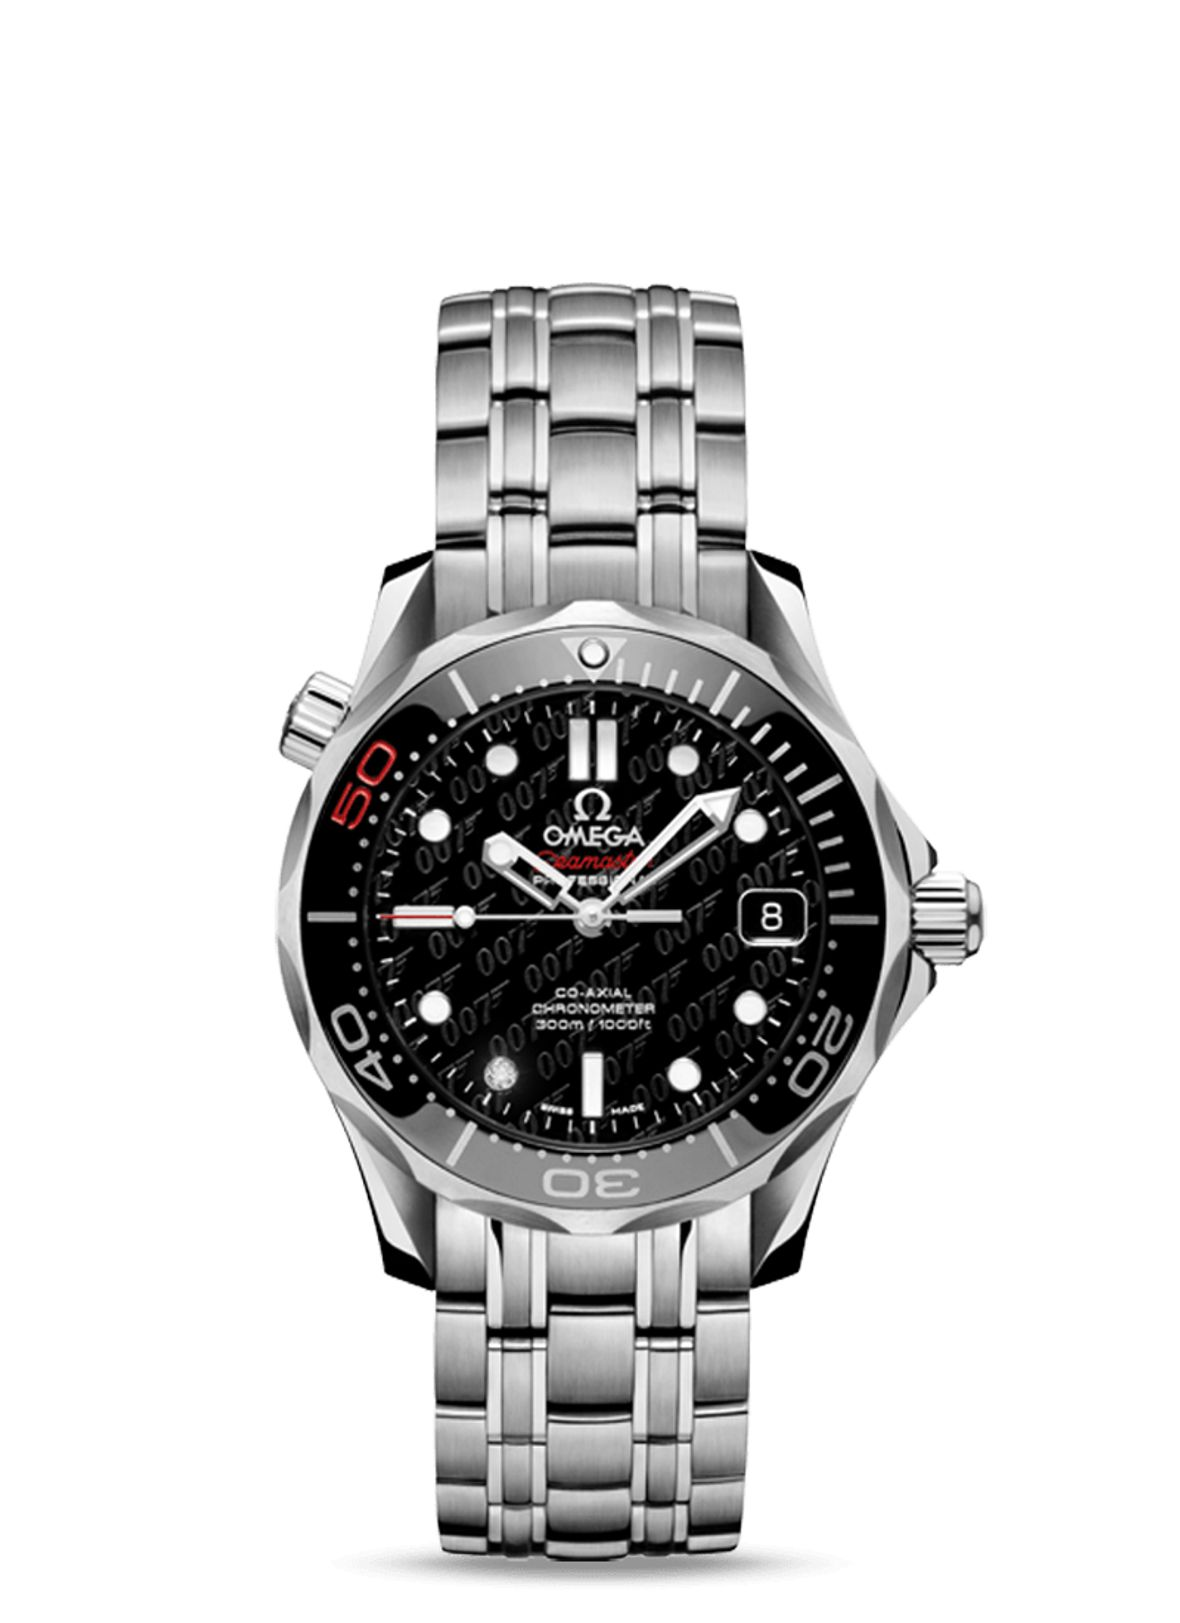 James Bond Omega Seamaster Diver 300M Midsize James Bond 50th Anniversary